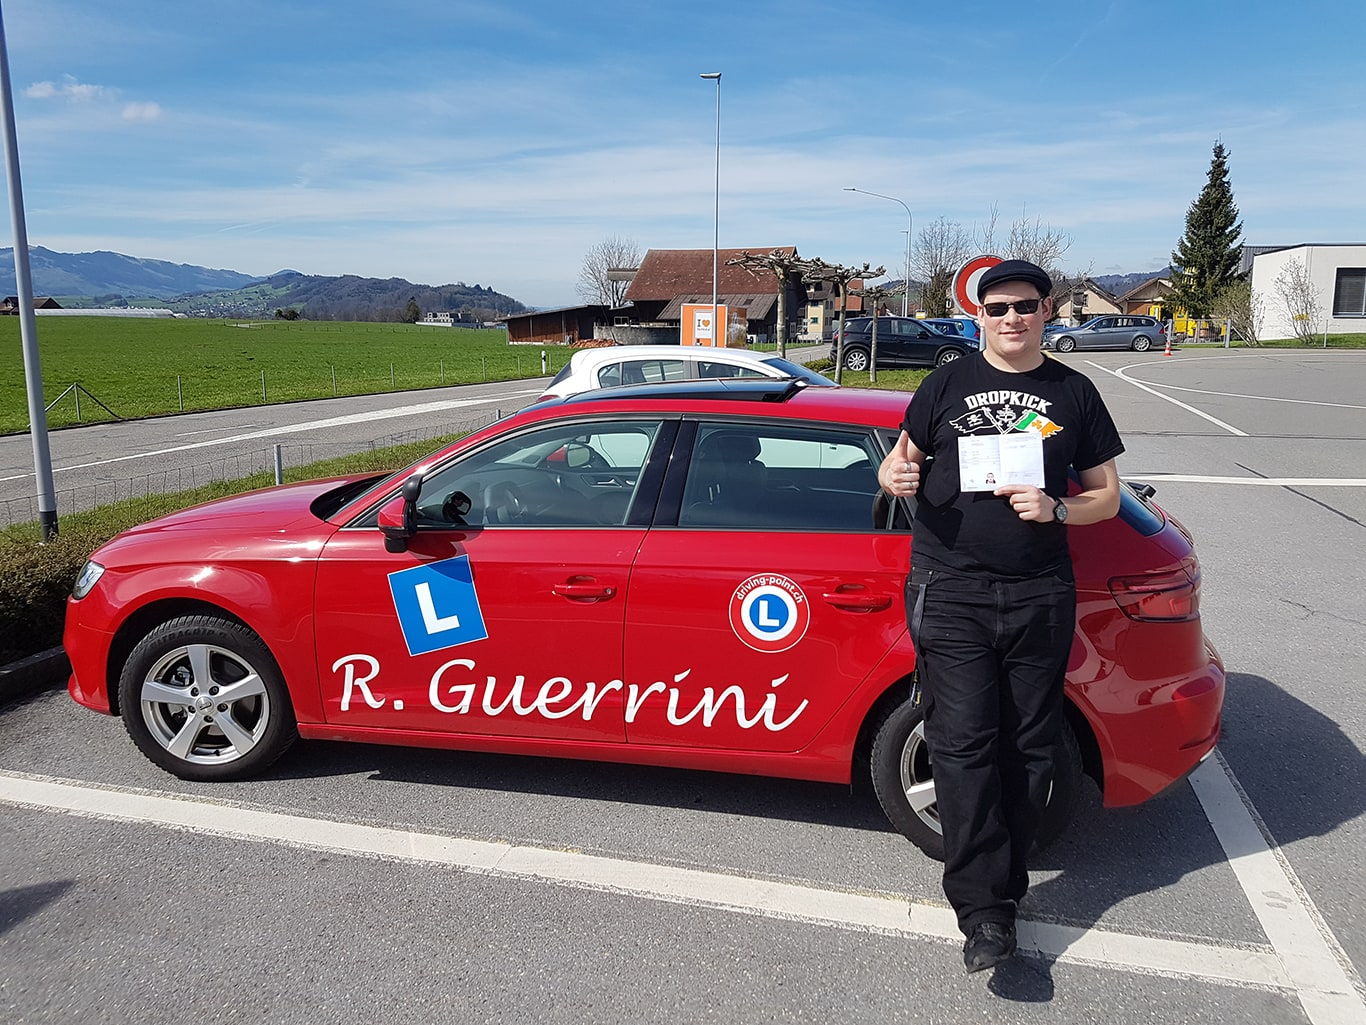 Motorrad Grundkurs, Verkehrskunde & Prüfung in Jona - Fahrschule Driving Point